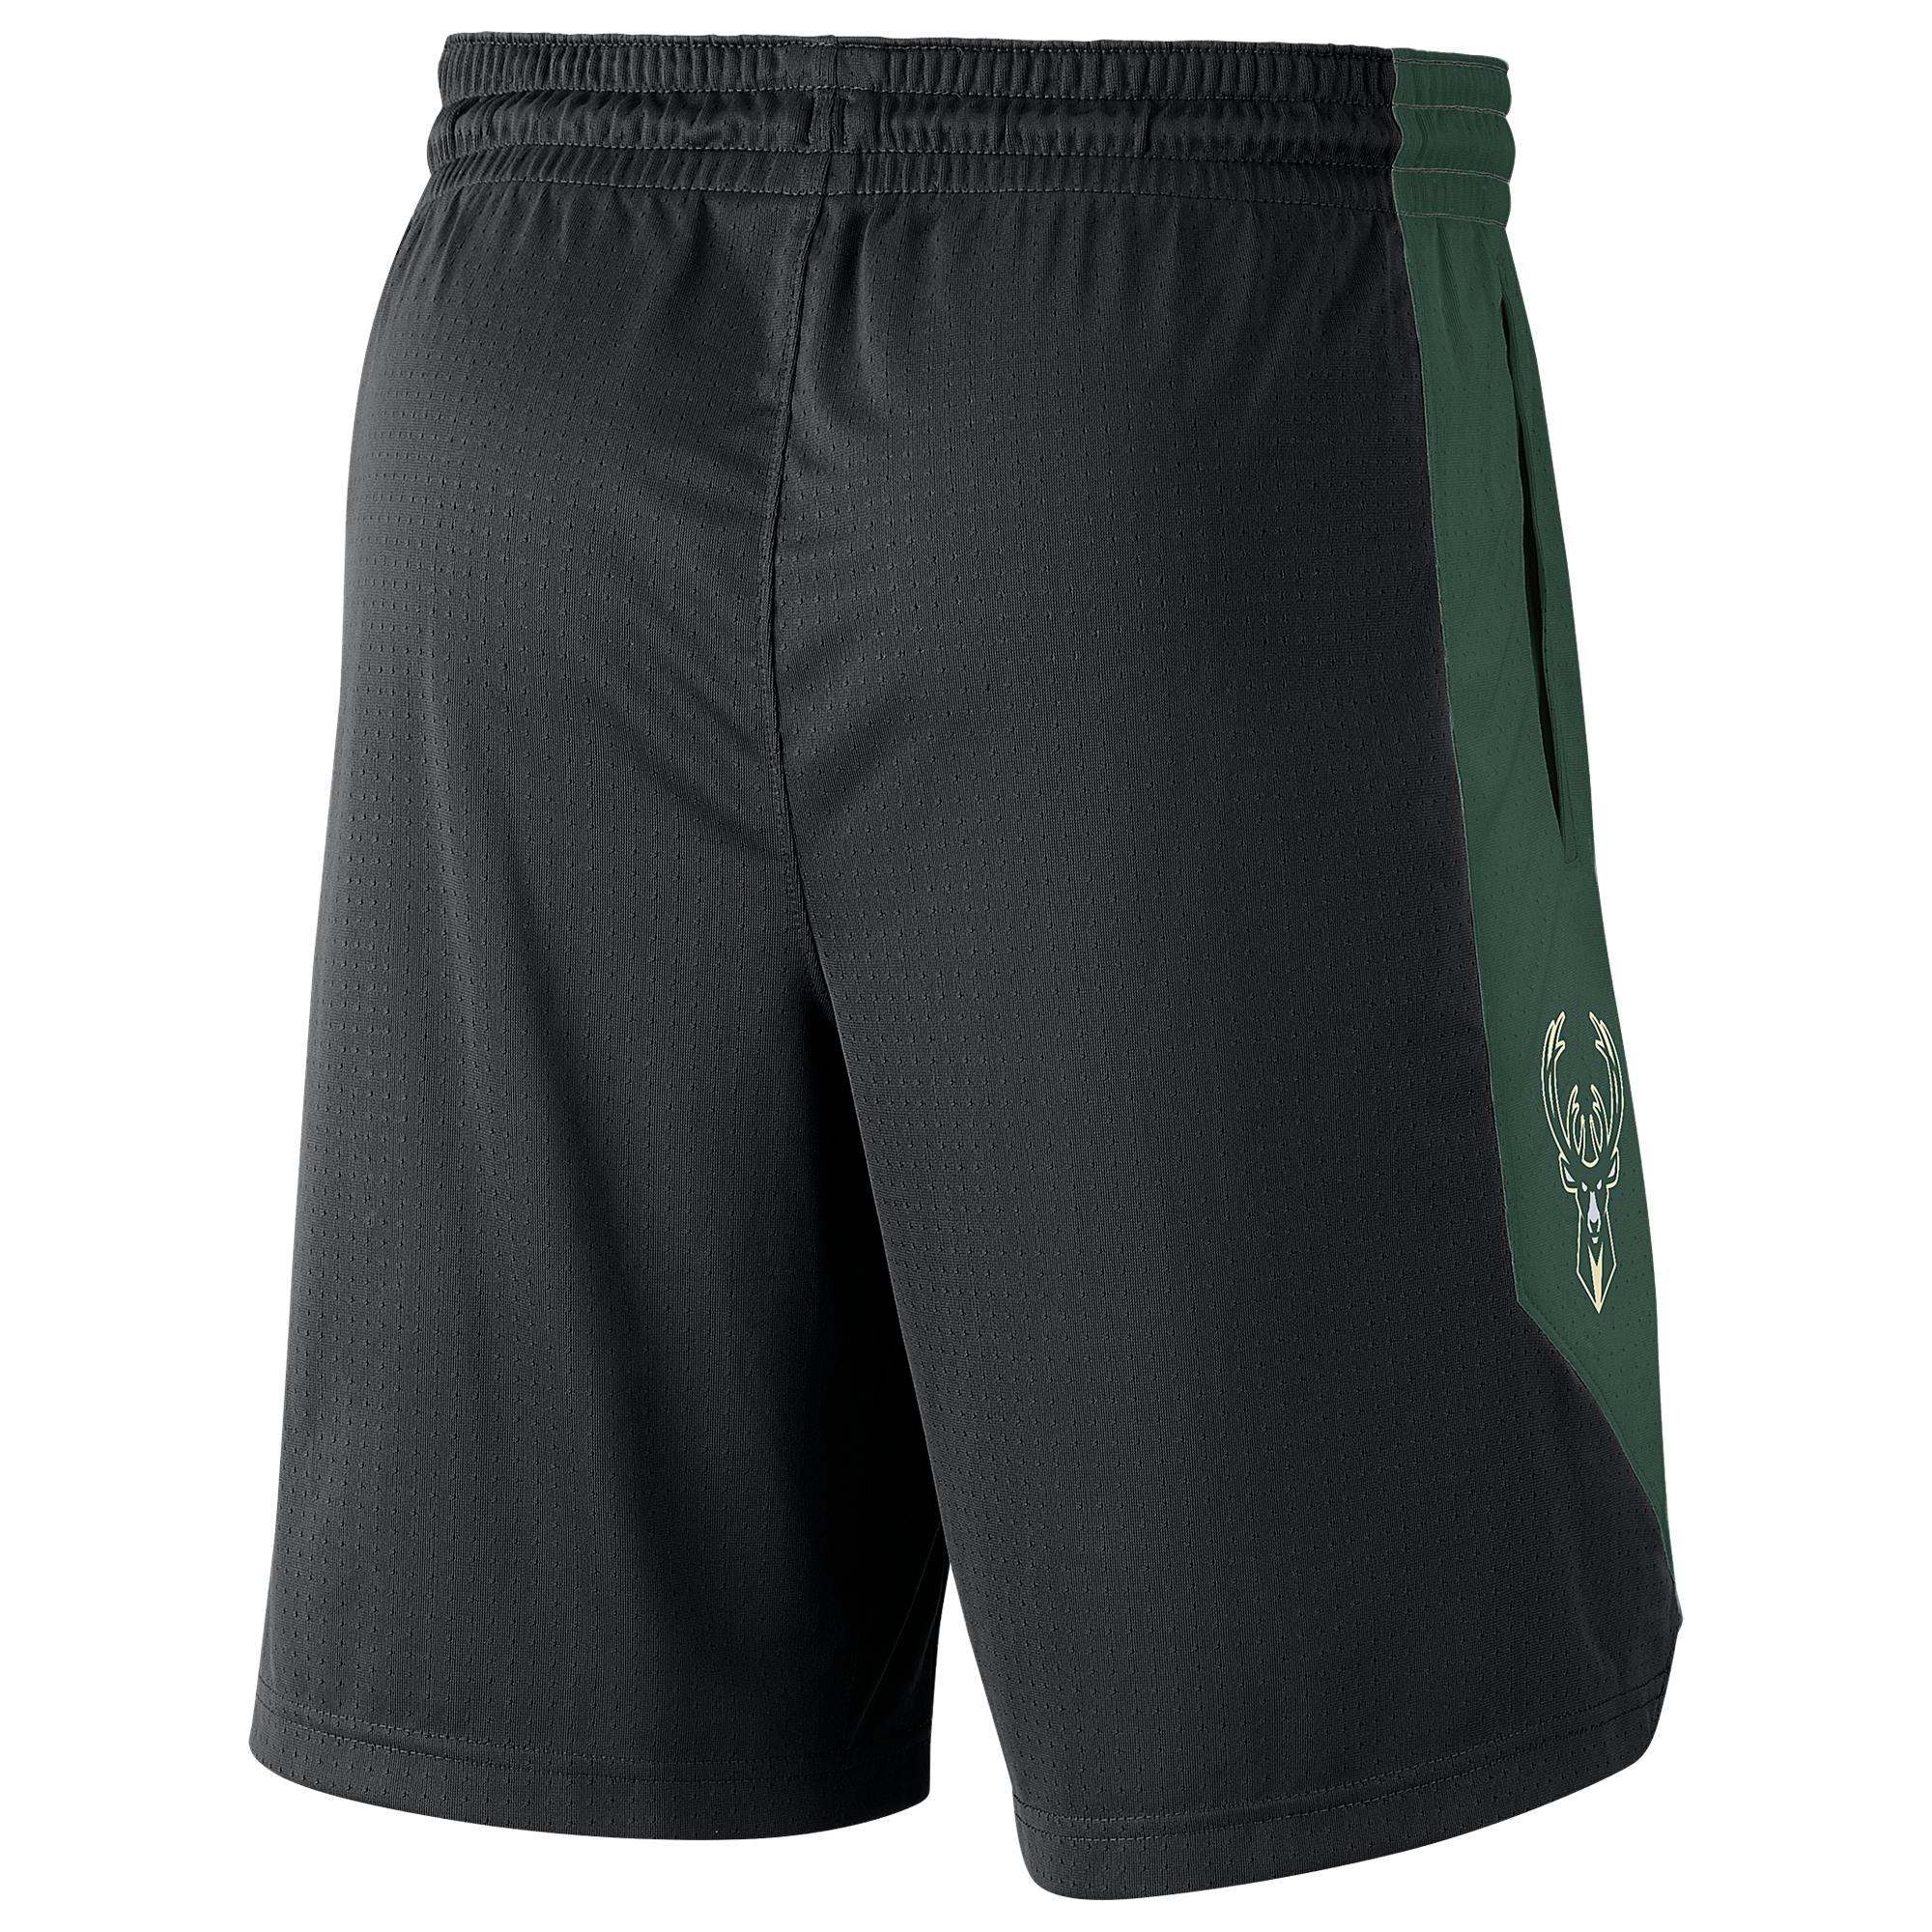 d4c2120d24d Nike - Black Milwaukee Bucks Nba Practice Shorts for Men - Lyst. View  fullscreen